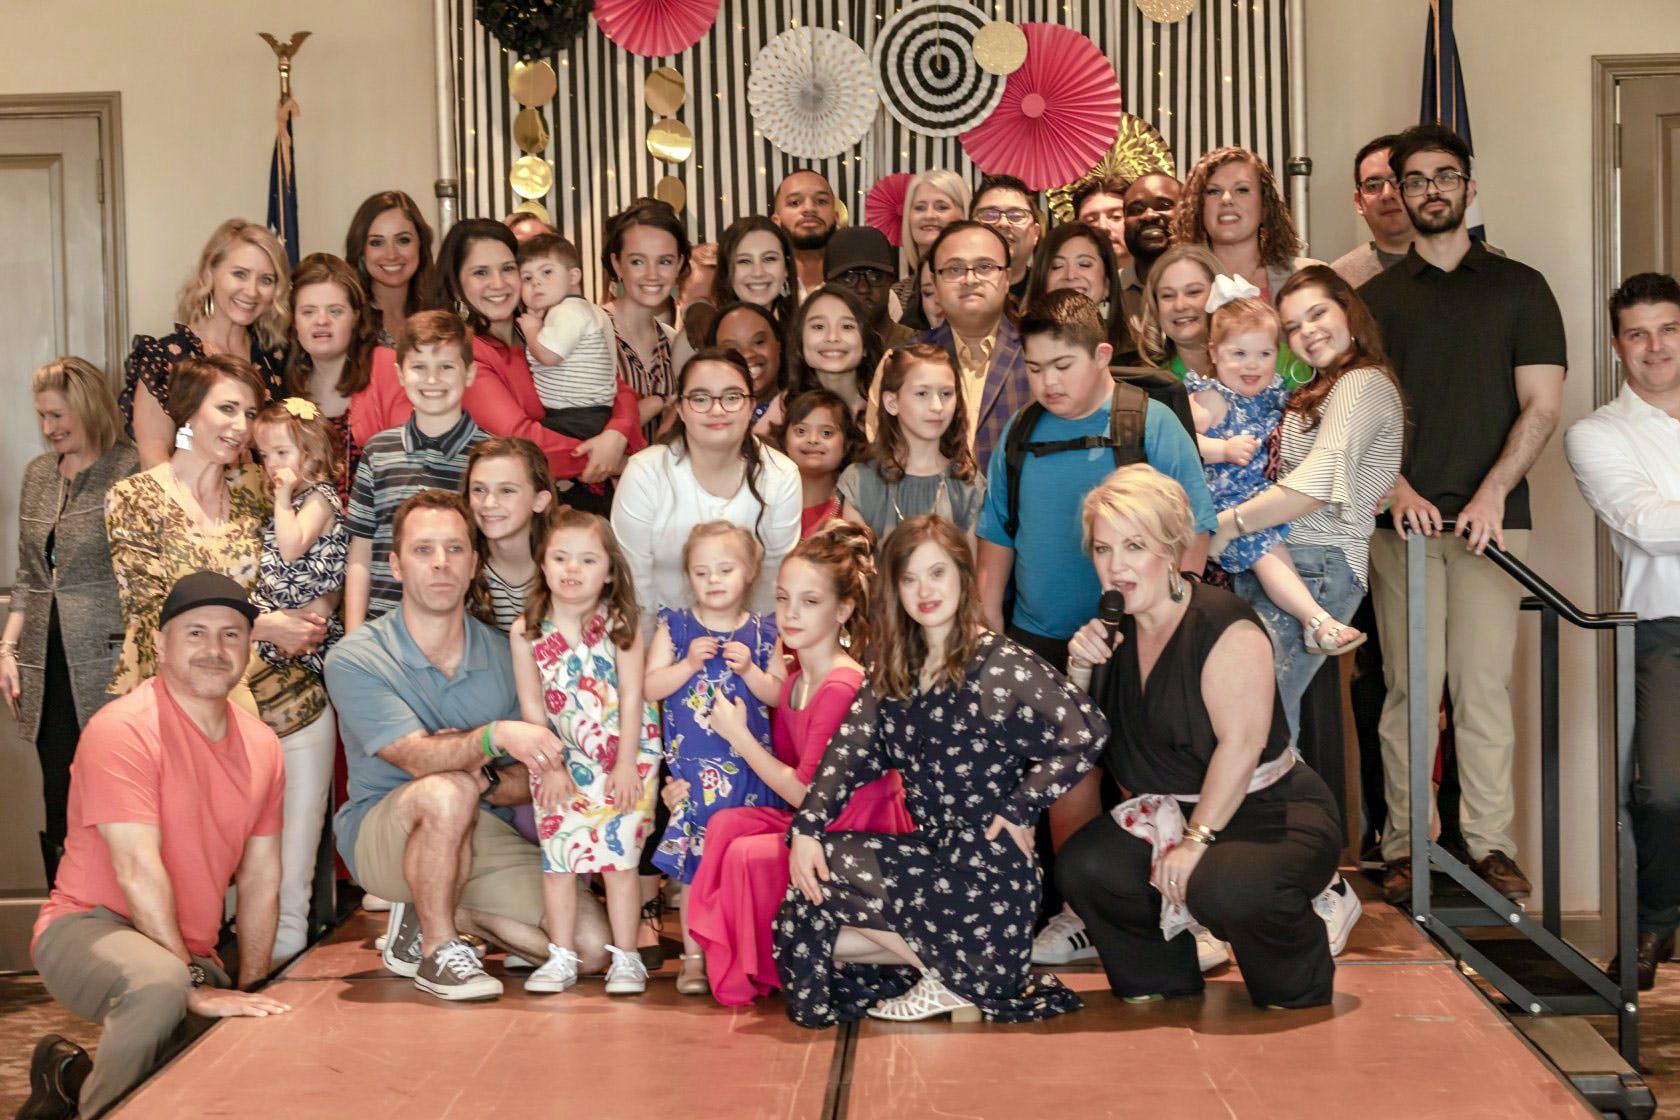 GiGis-Playhouse-Sugar-Land-2019-Fashion-Show-Luncheon-Event-Press-Release